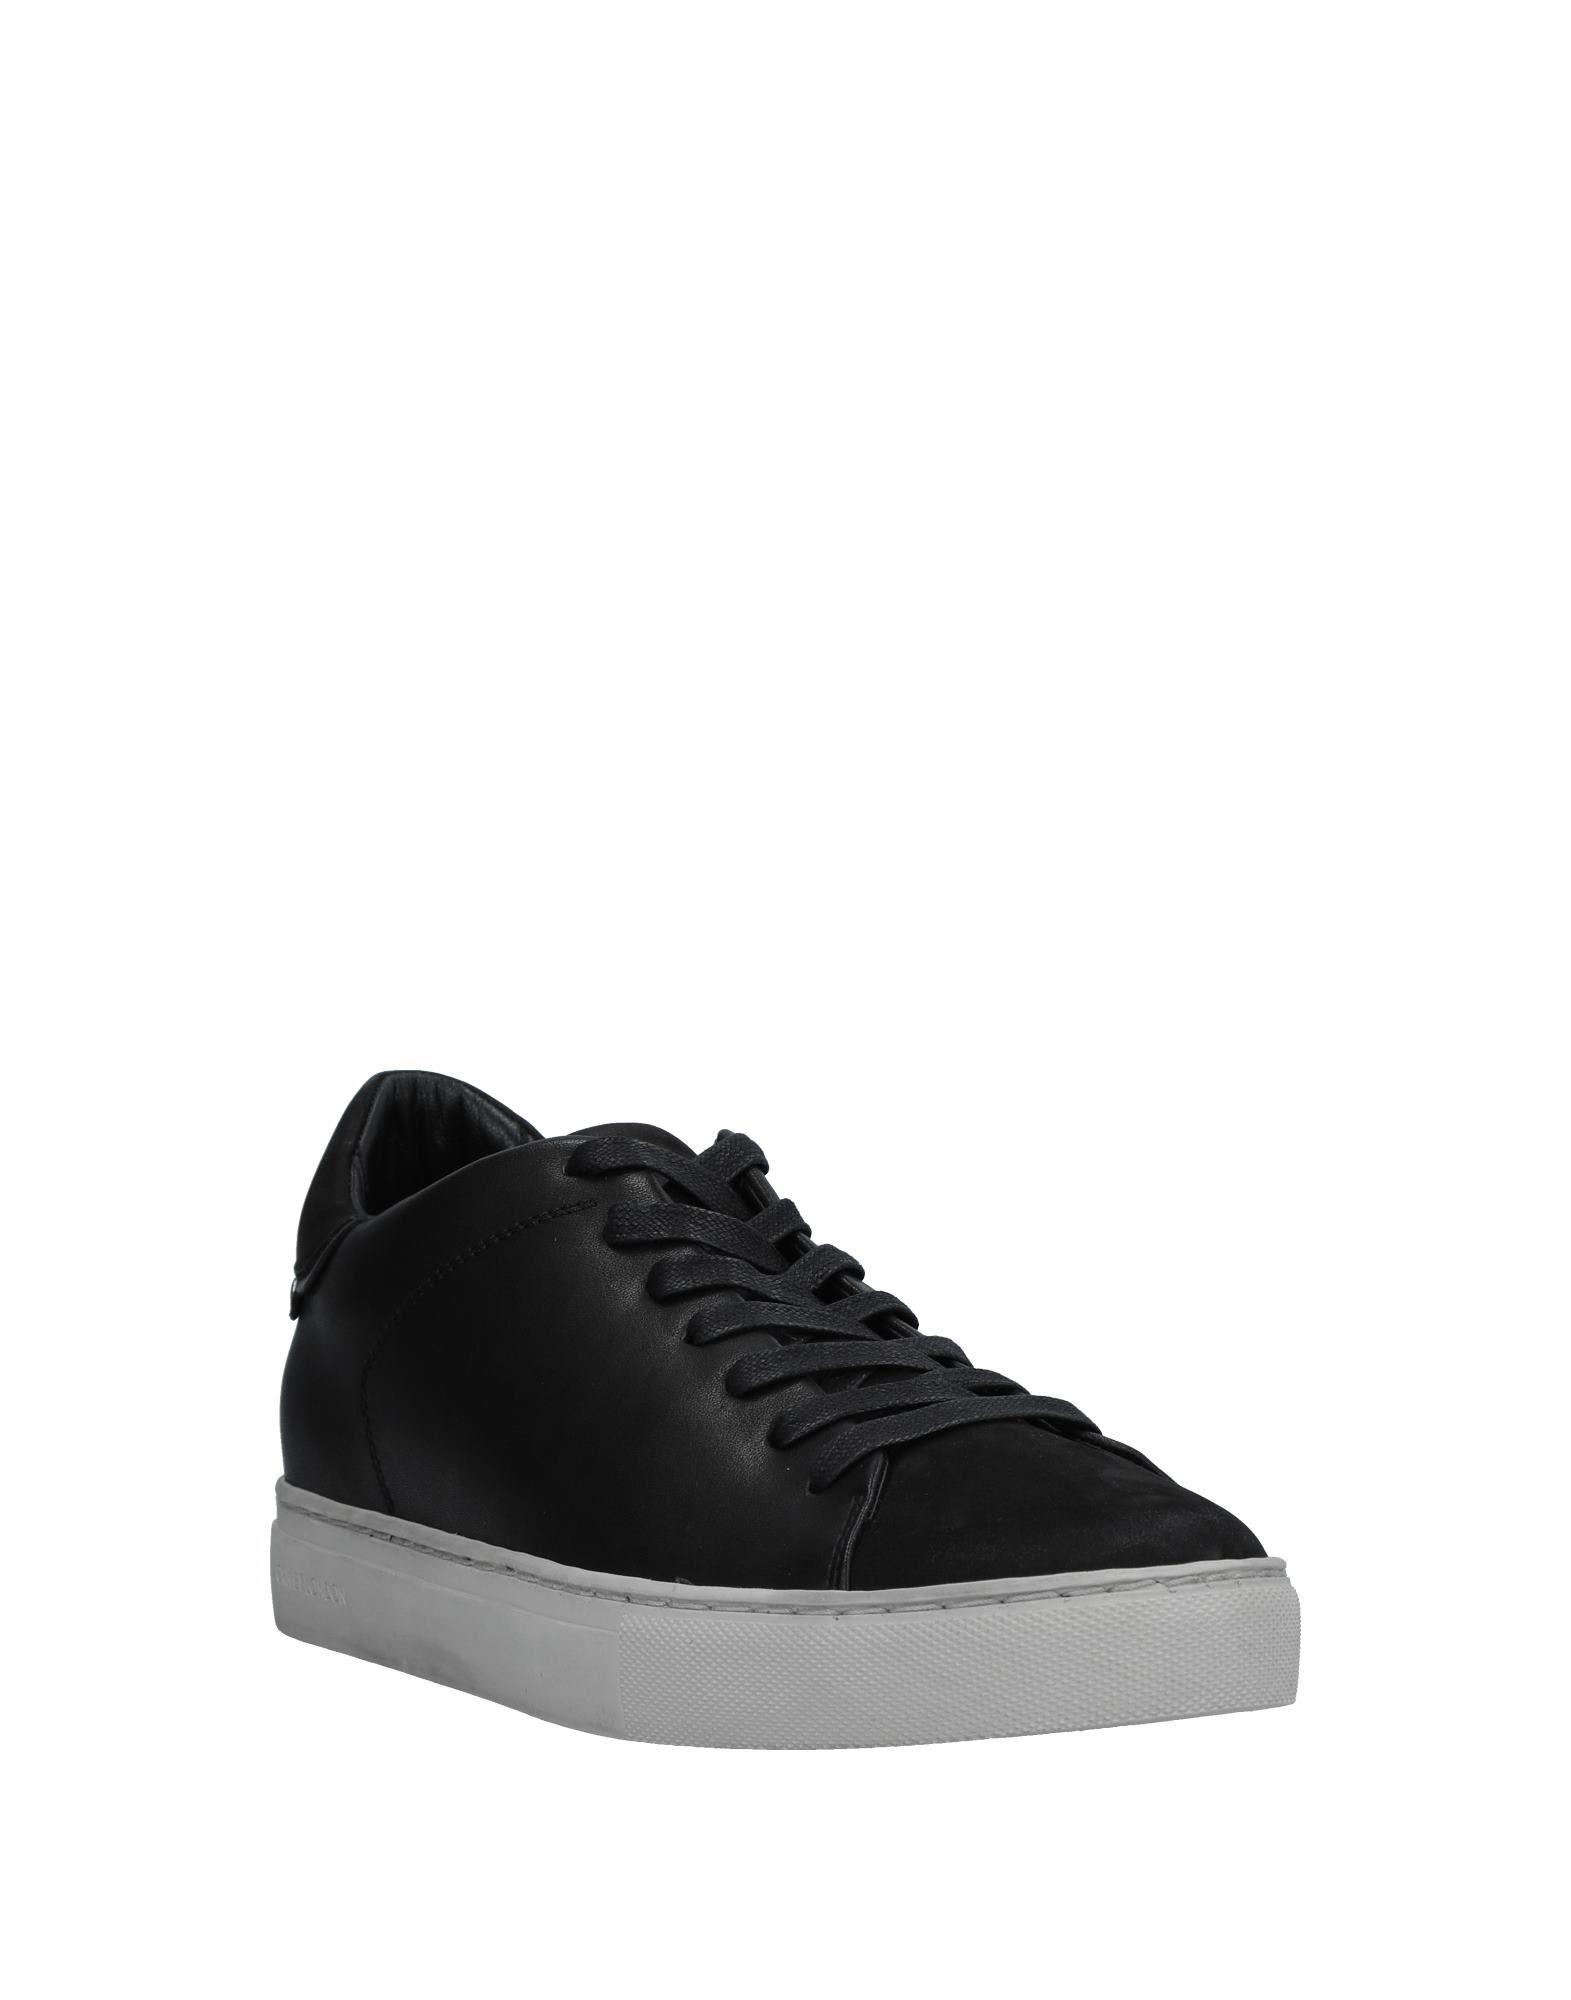 Rabatt echte Schuhe Crime  London Sneakers Herren  Crime 11535770DO ad1170